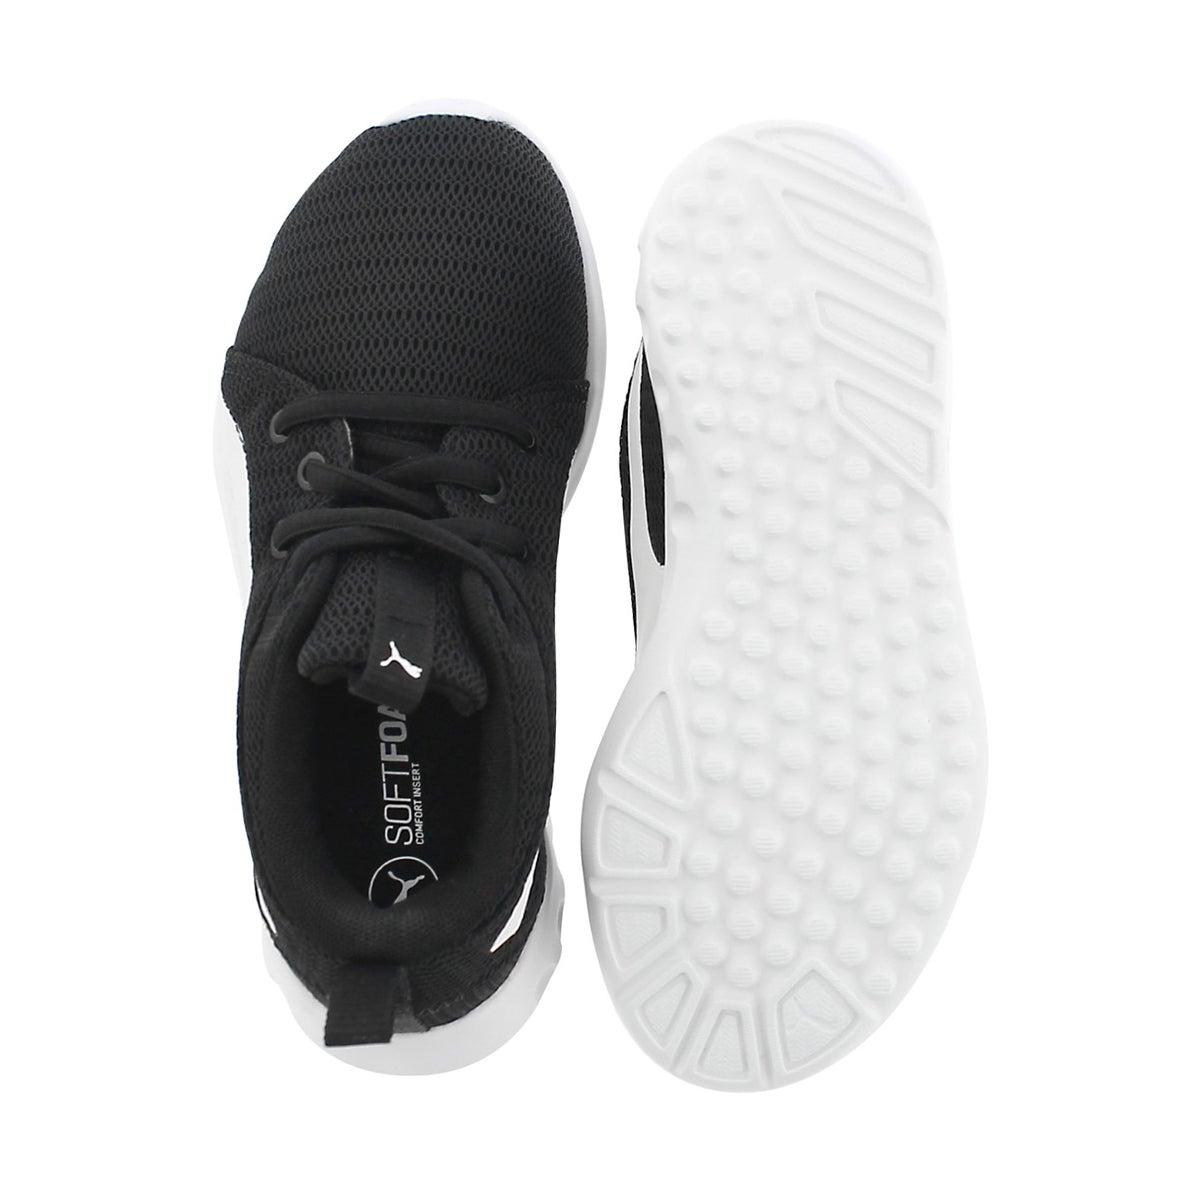 Bys Carson 2 Jr black lace up sneaker